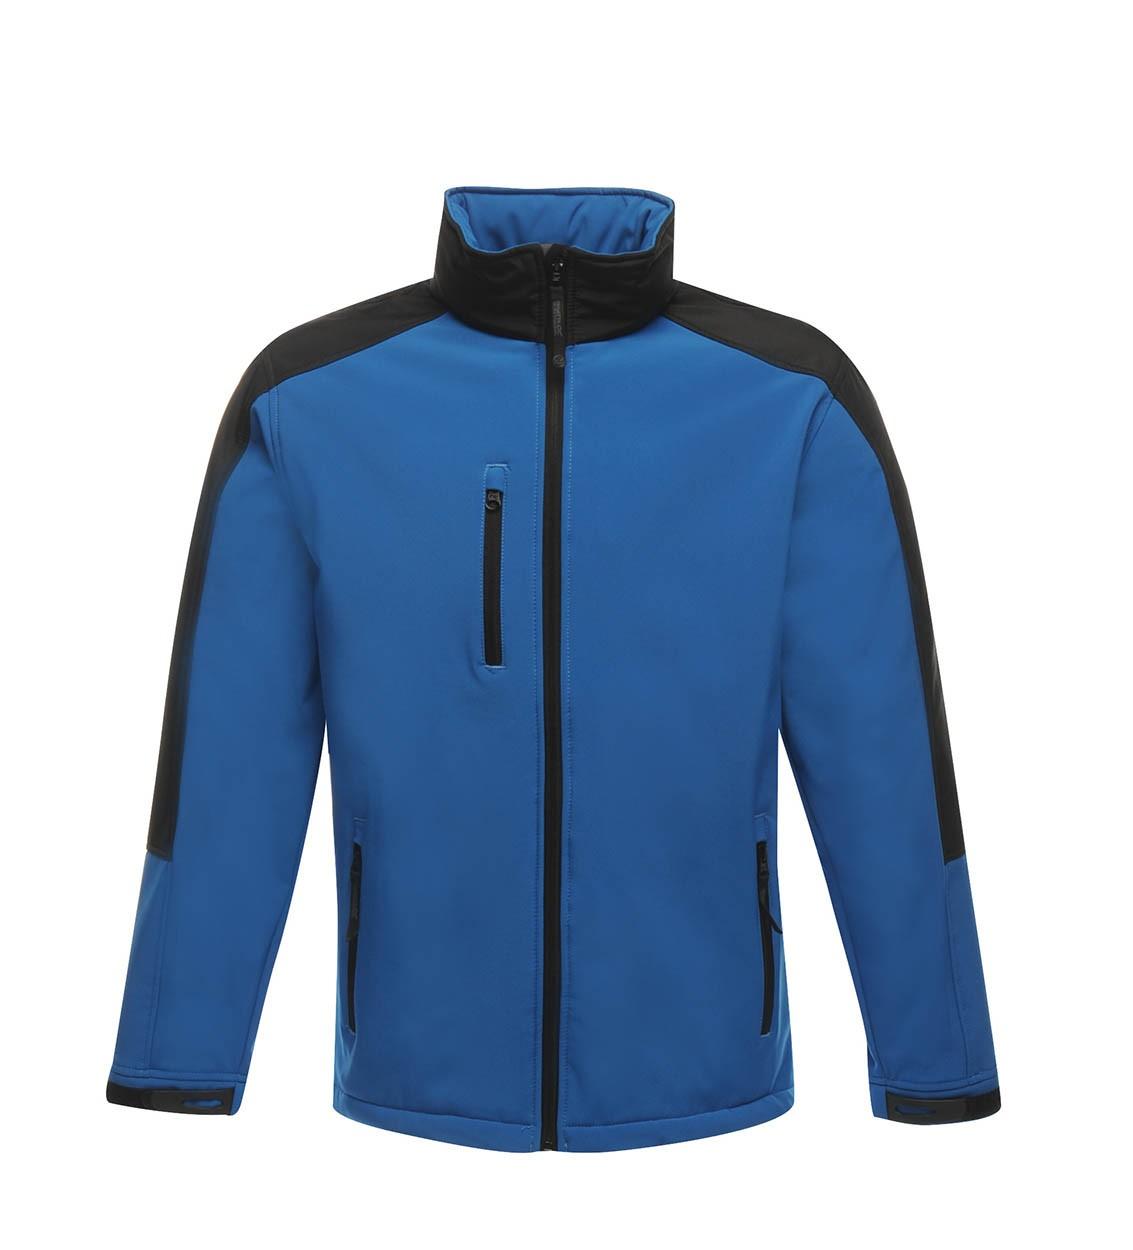 Regatta Mens Classic 3-Layer Soft Shell Long Sleeve Jacket